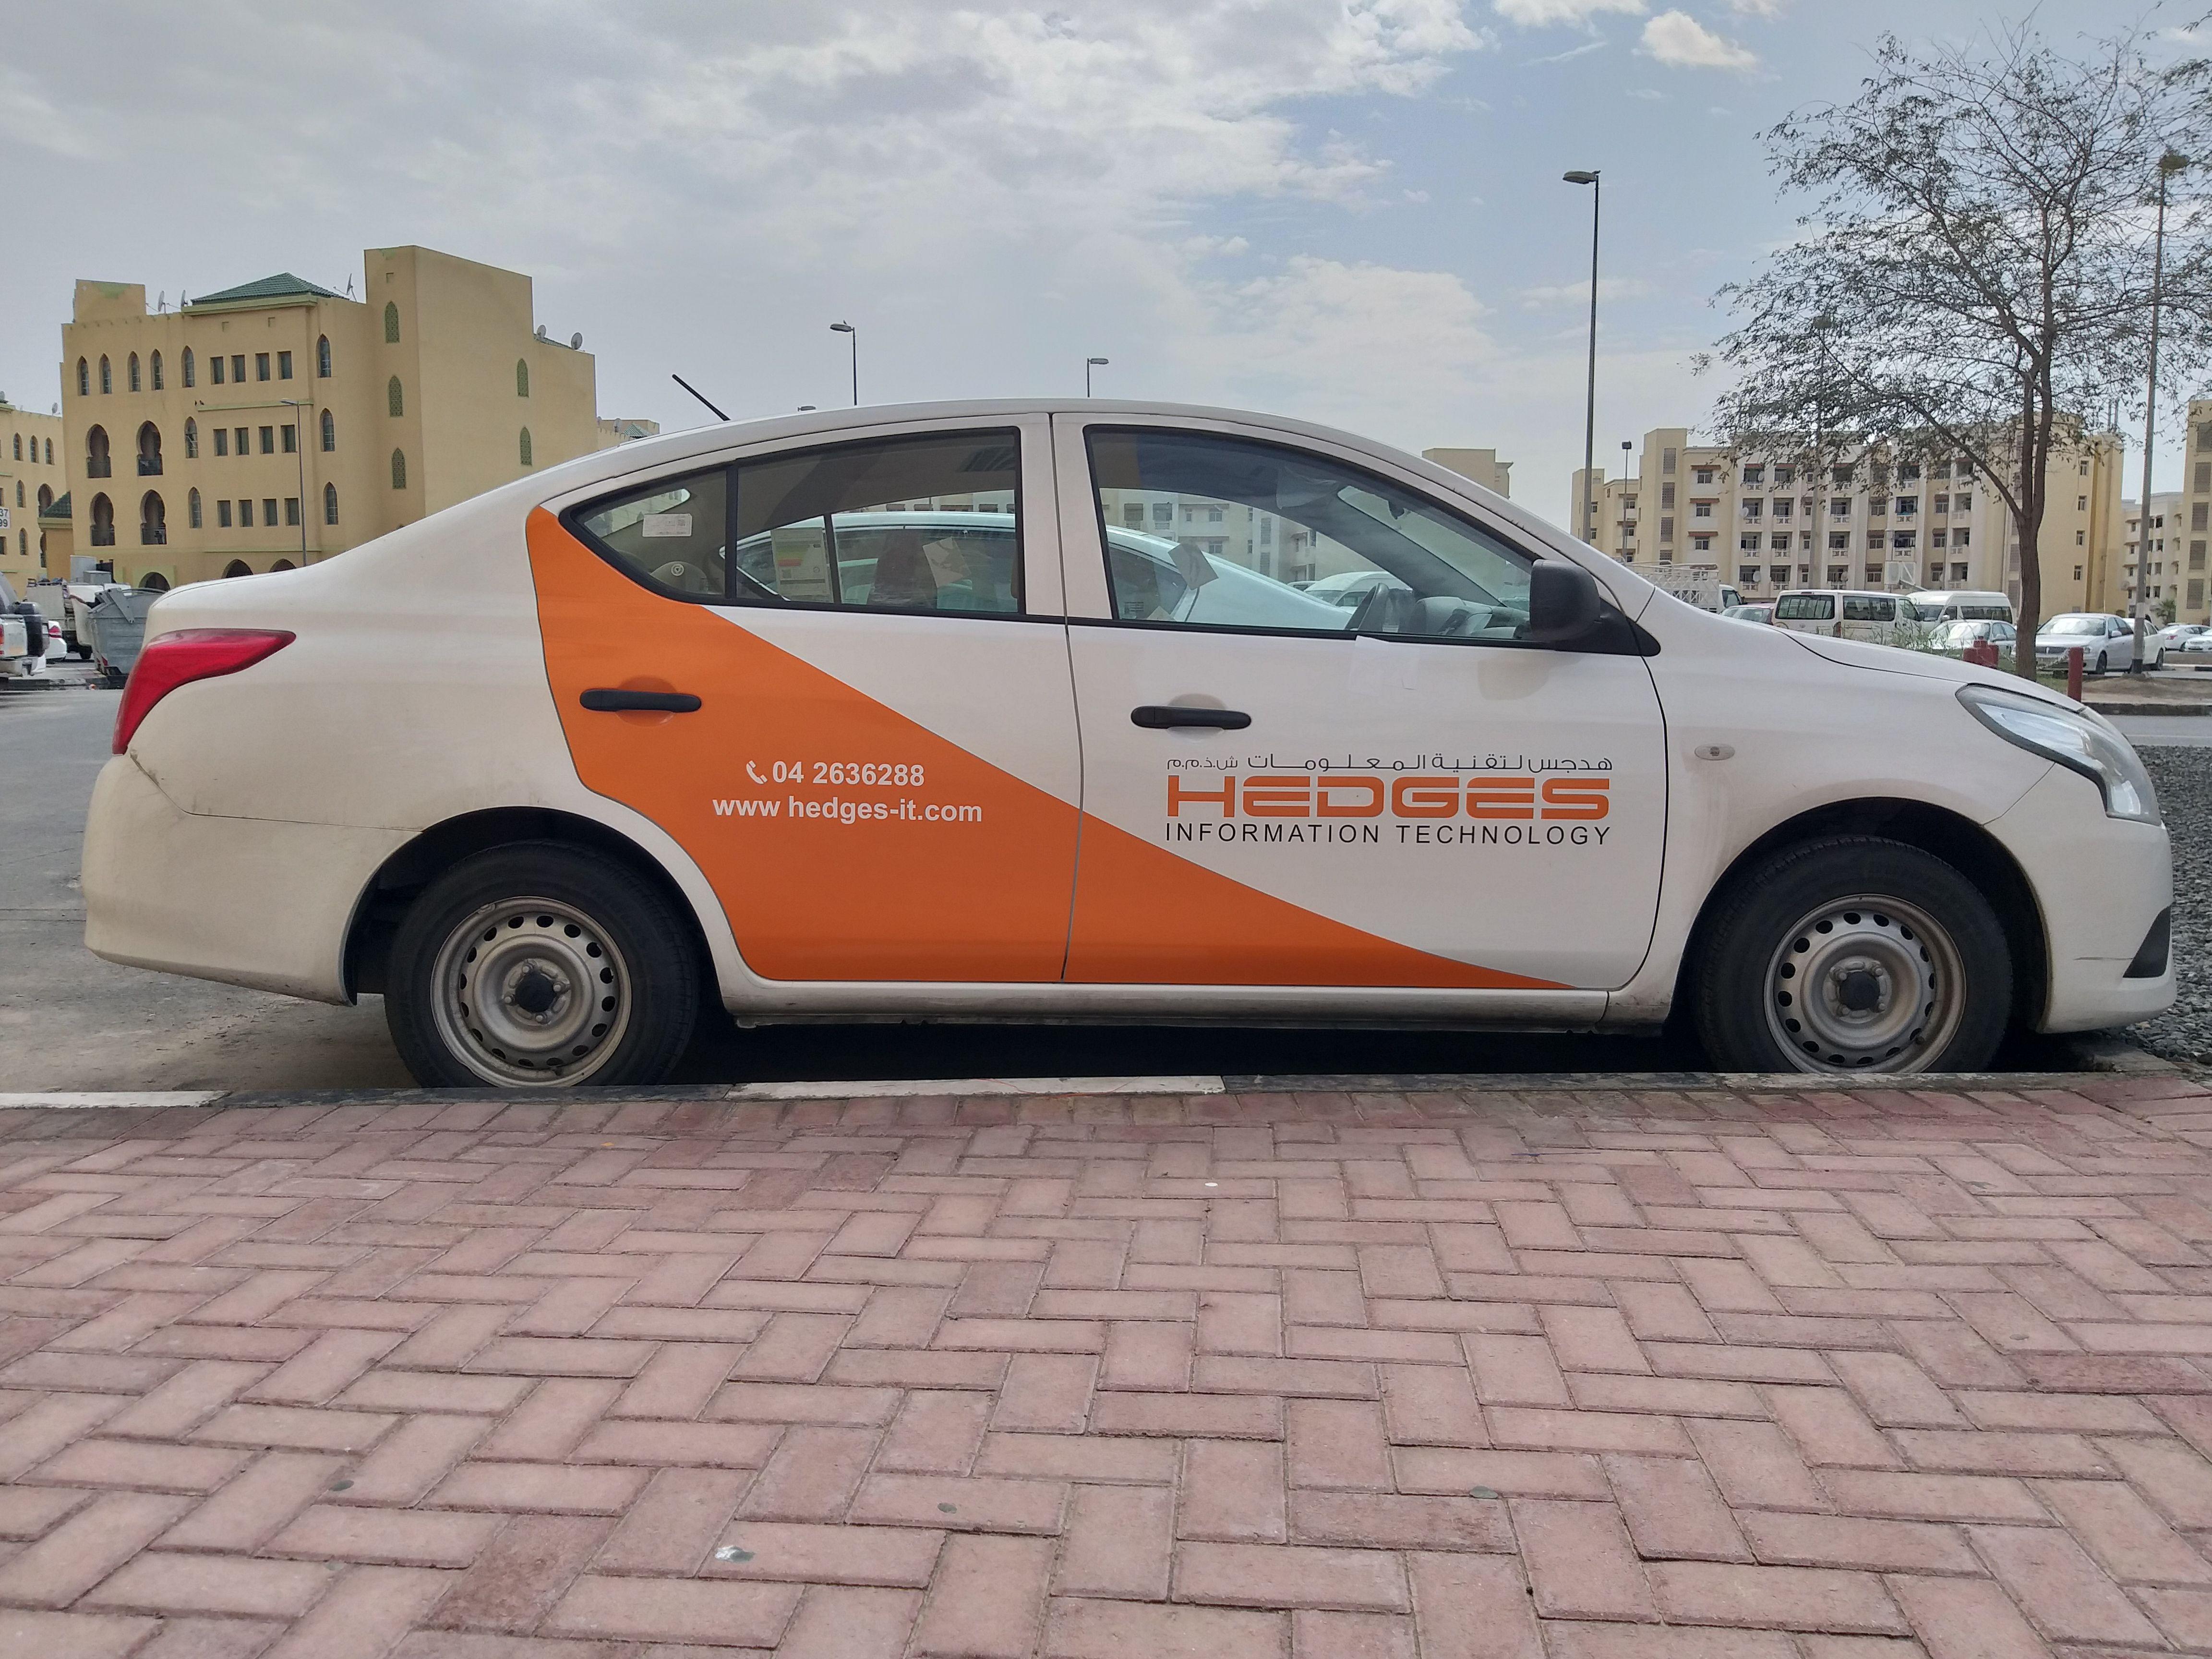 Vehicle Branding Car Stickers Bus Wrapping Vehicle Advertisement In Dubai Car Brands Car Advertising Vinyl Wrap Car [ 3456 x 4608 Pixel ]